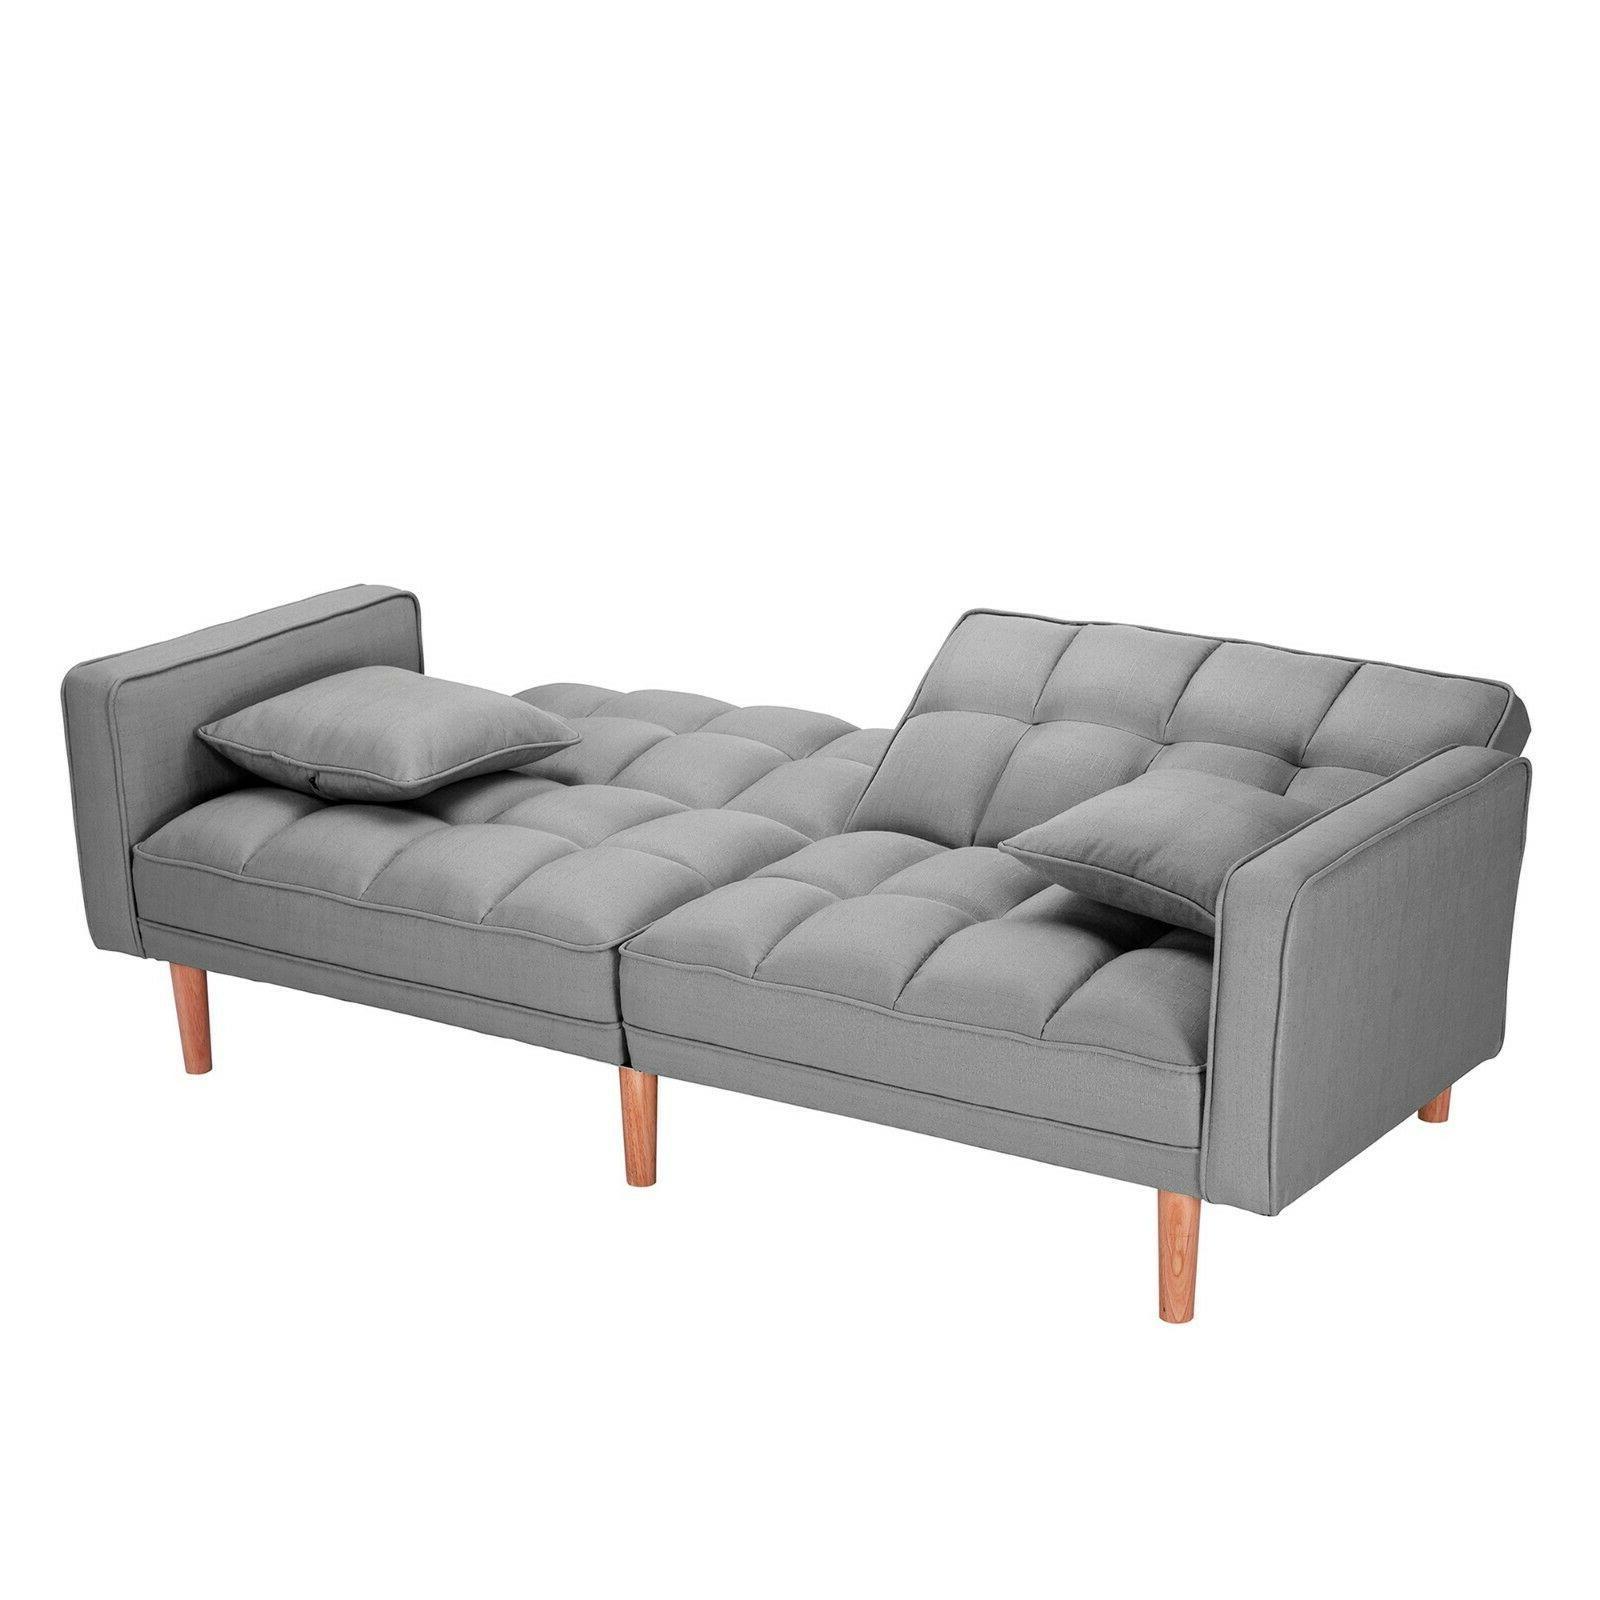 Modern Bed Pillows Folding Lounge Sofa USA